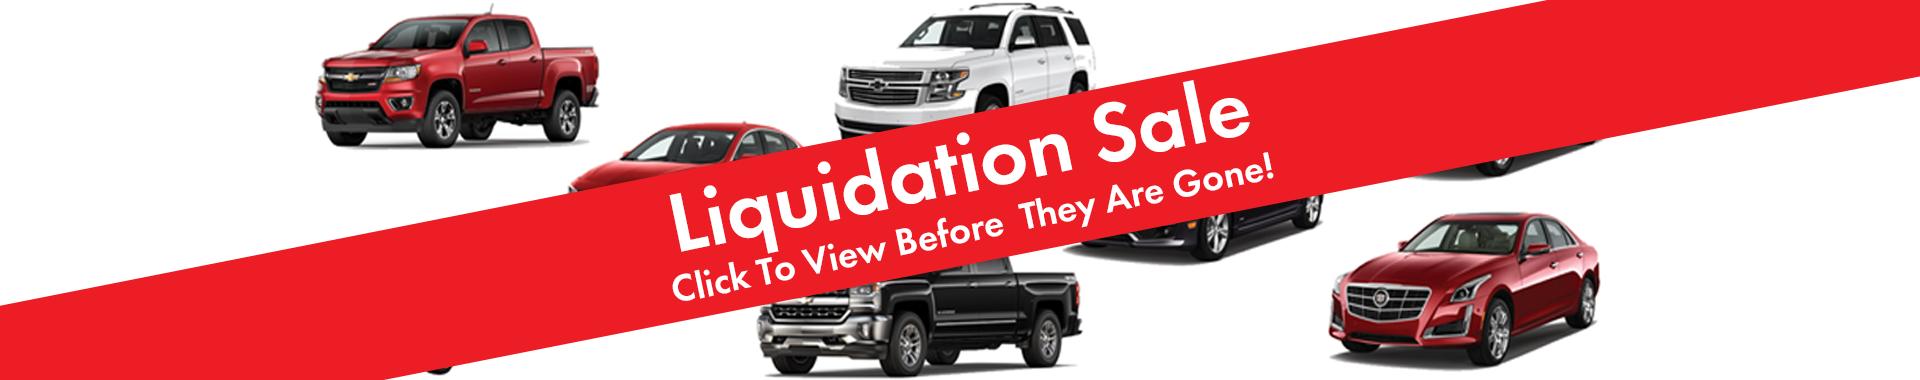 Liquidation Slide